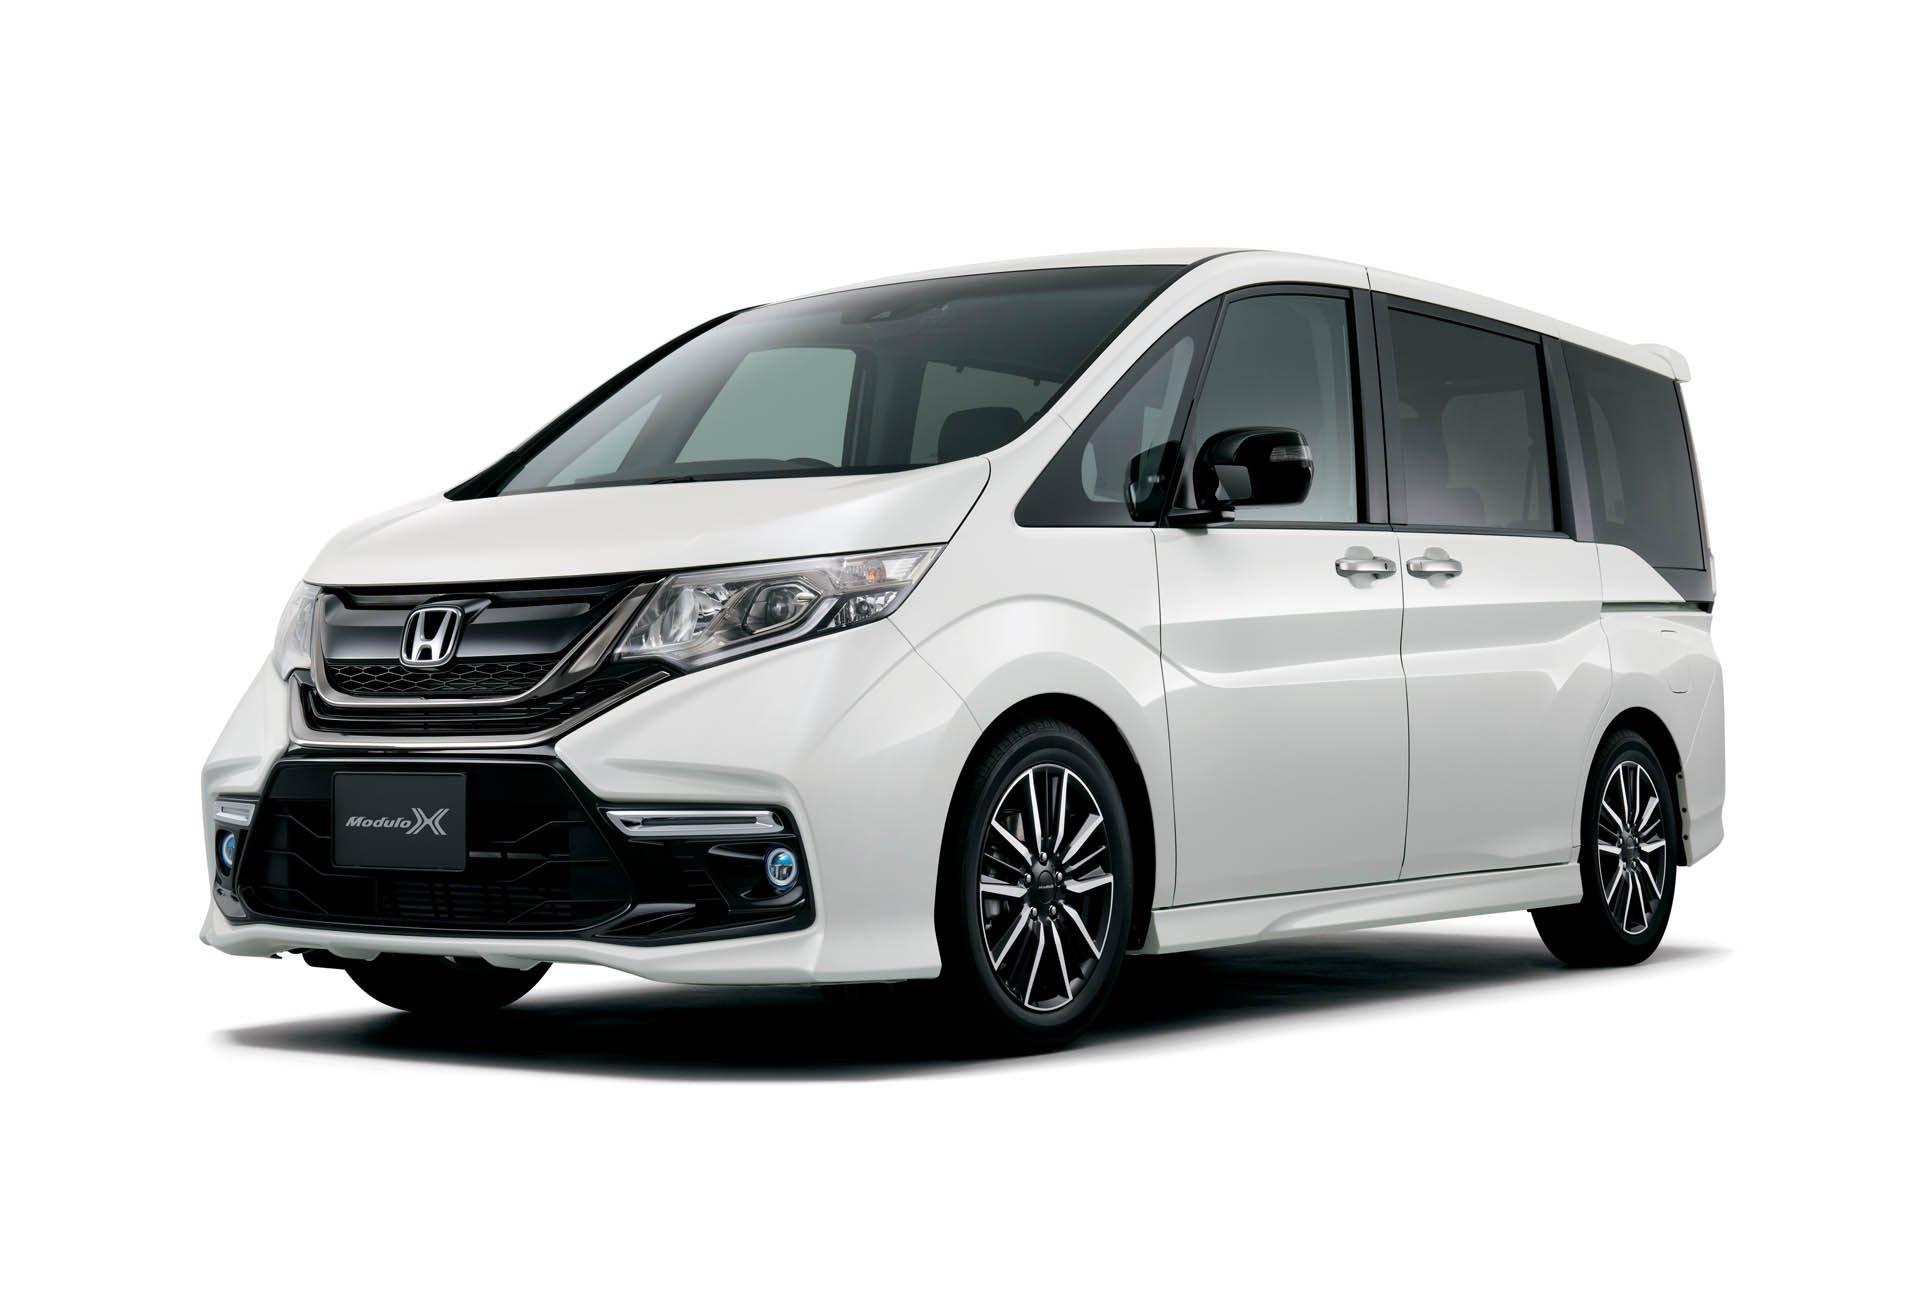 Honda_ Step_WGN_Modulo_X_0001